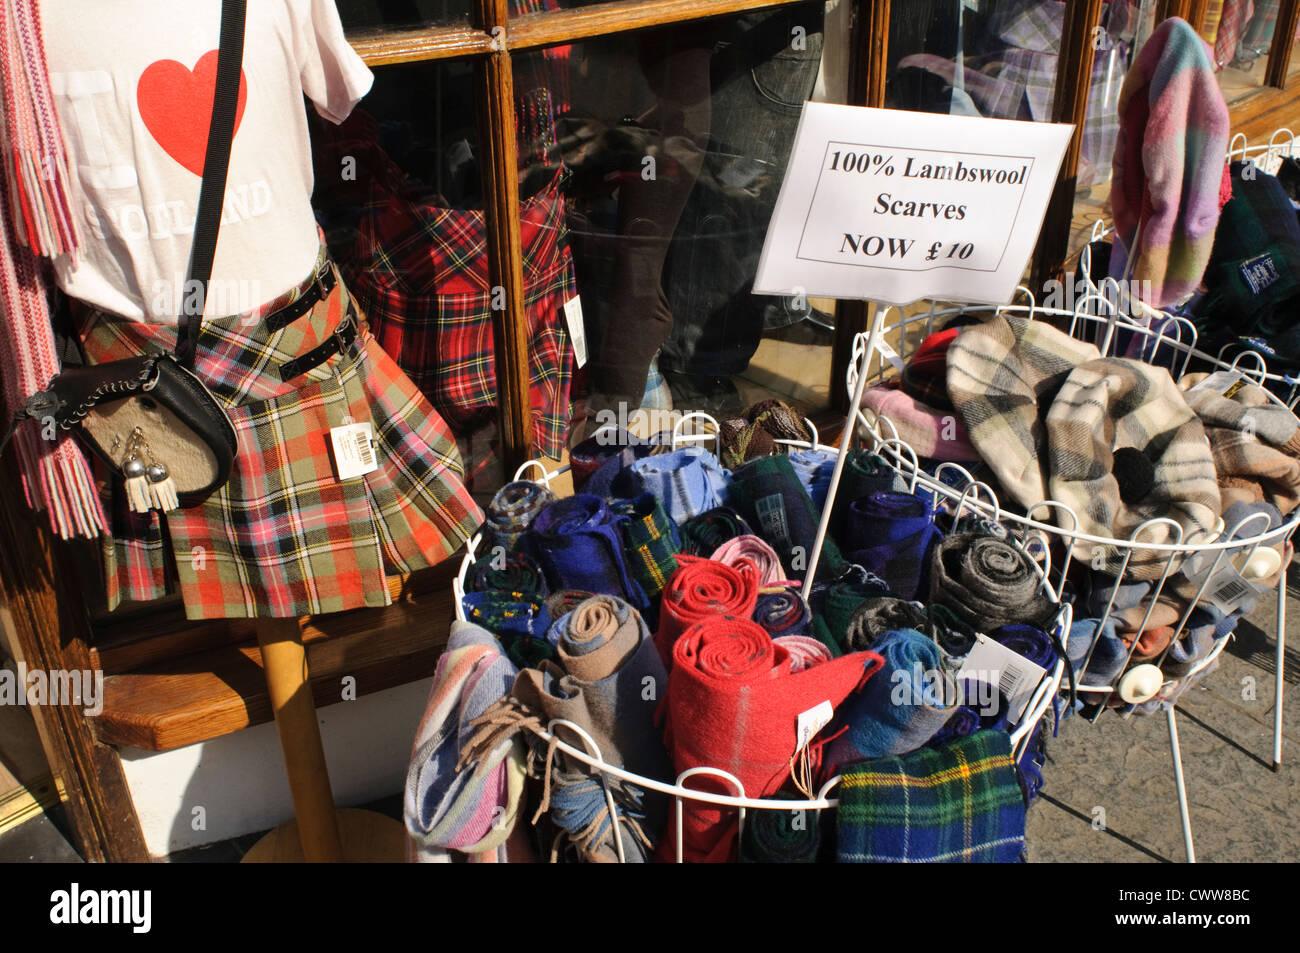 Tumble baskets of Scottish knitwear on The Royal Mile, Edinburgh. - Stock Image